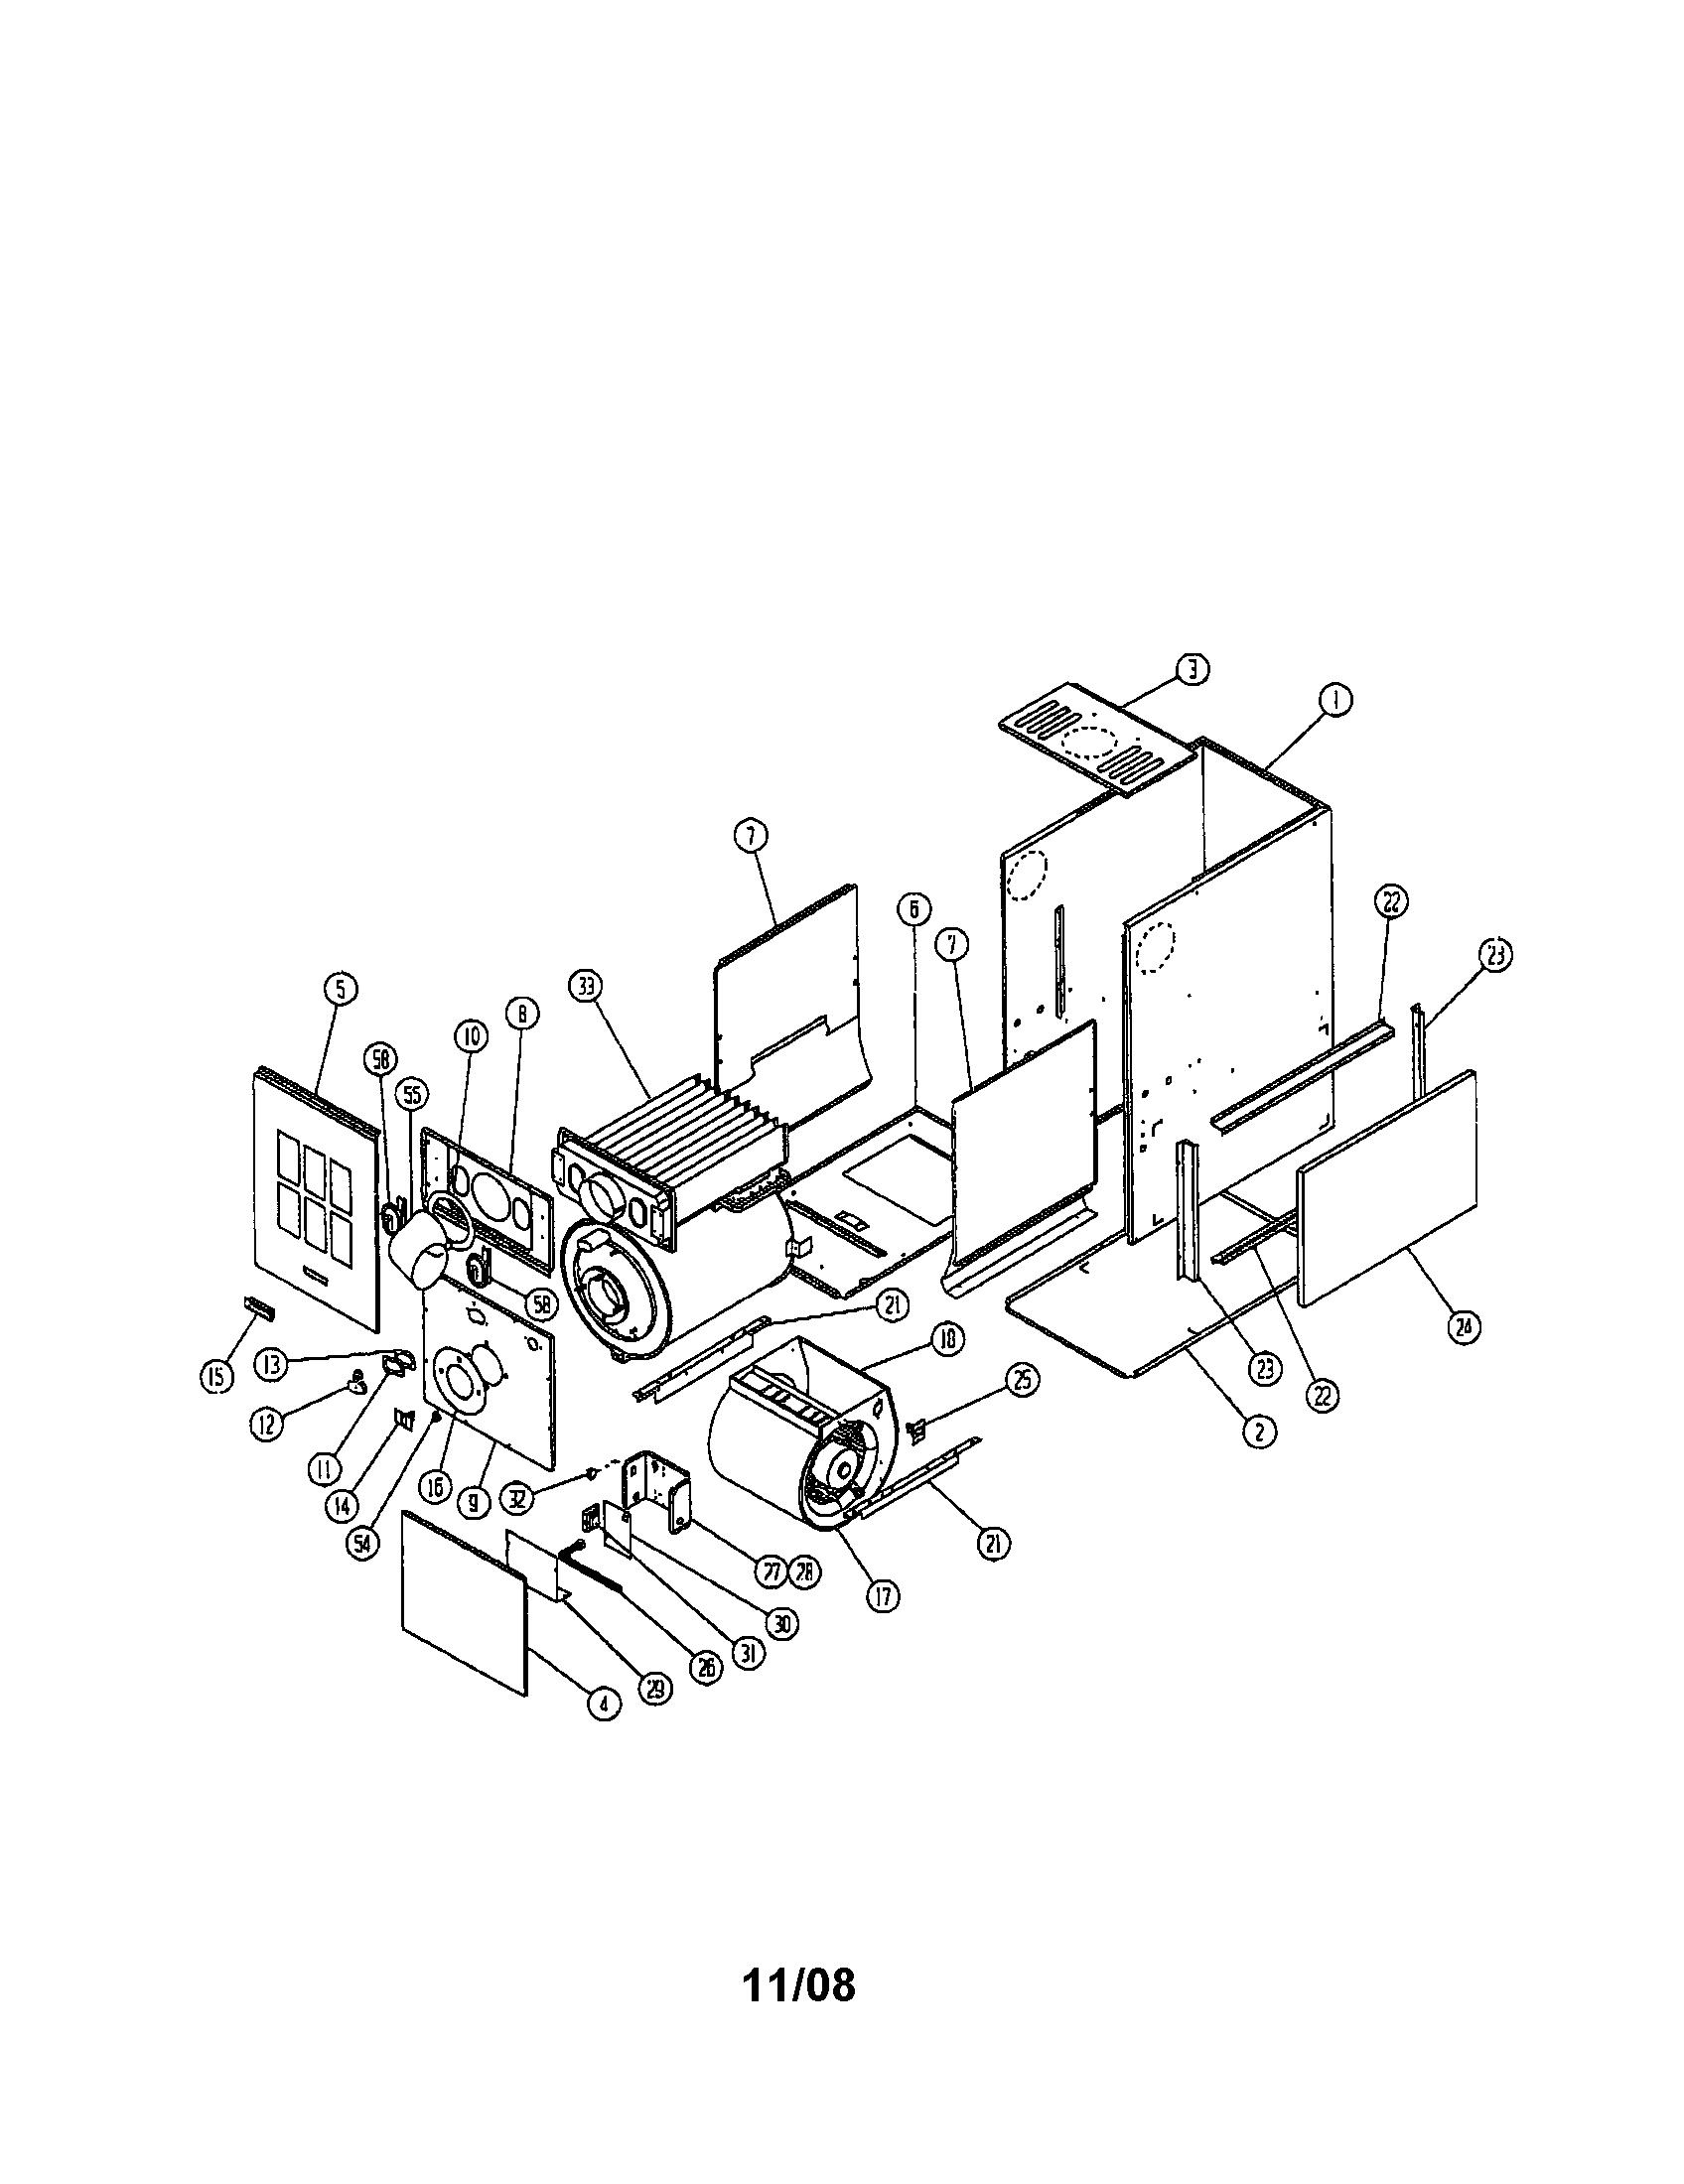 ducane furnace model mpga100b4a manual